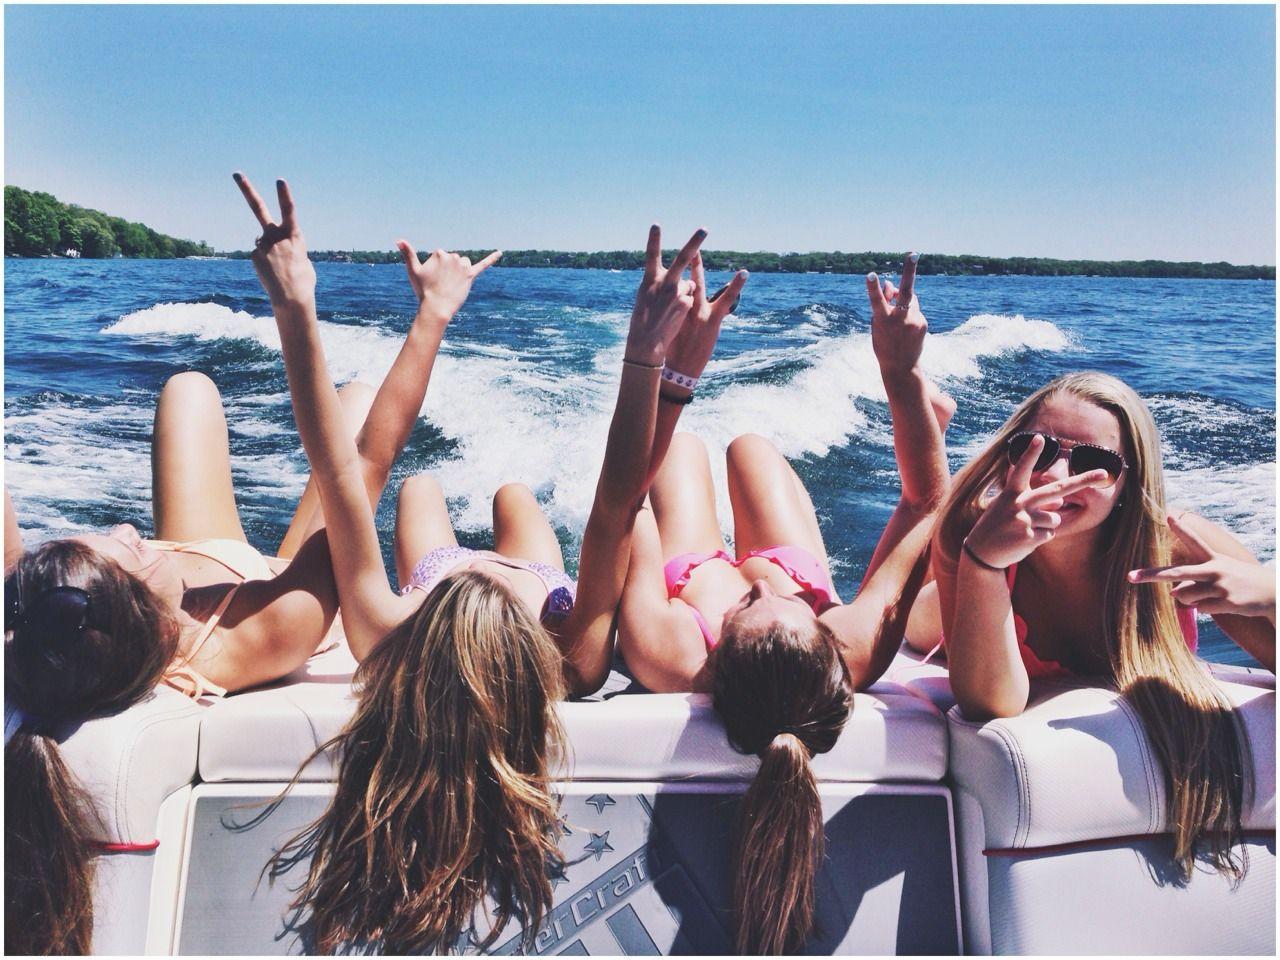 Naket teen swimming of boat